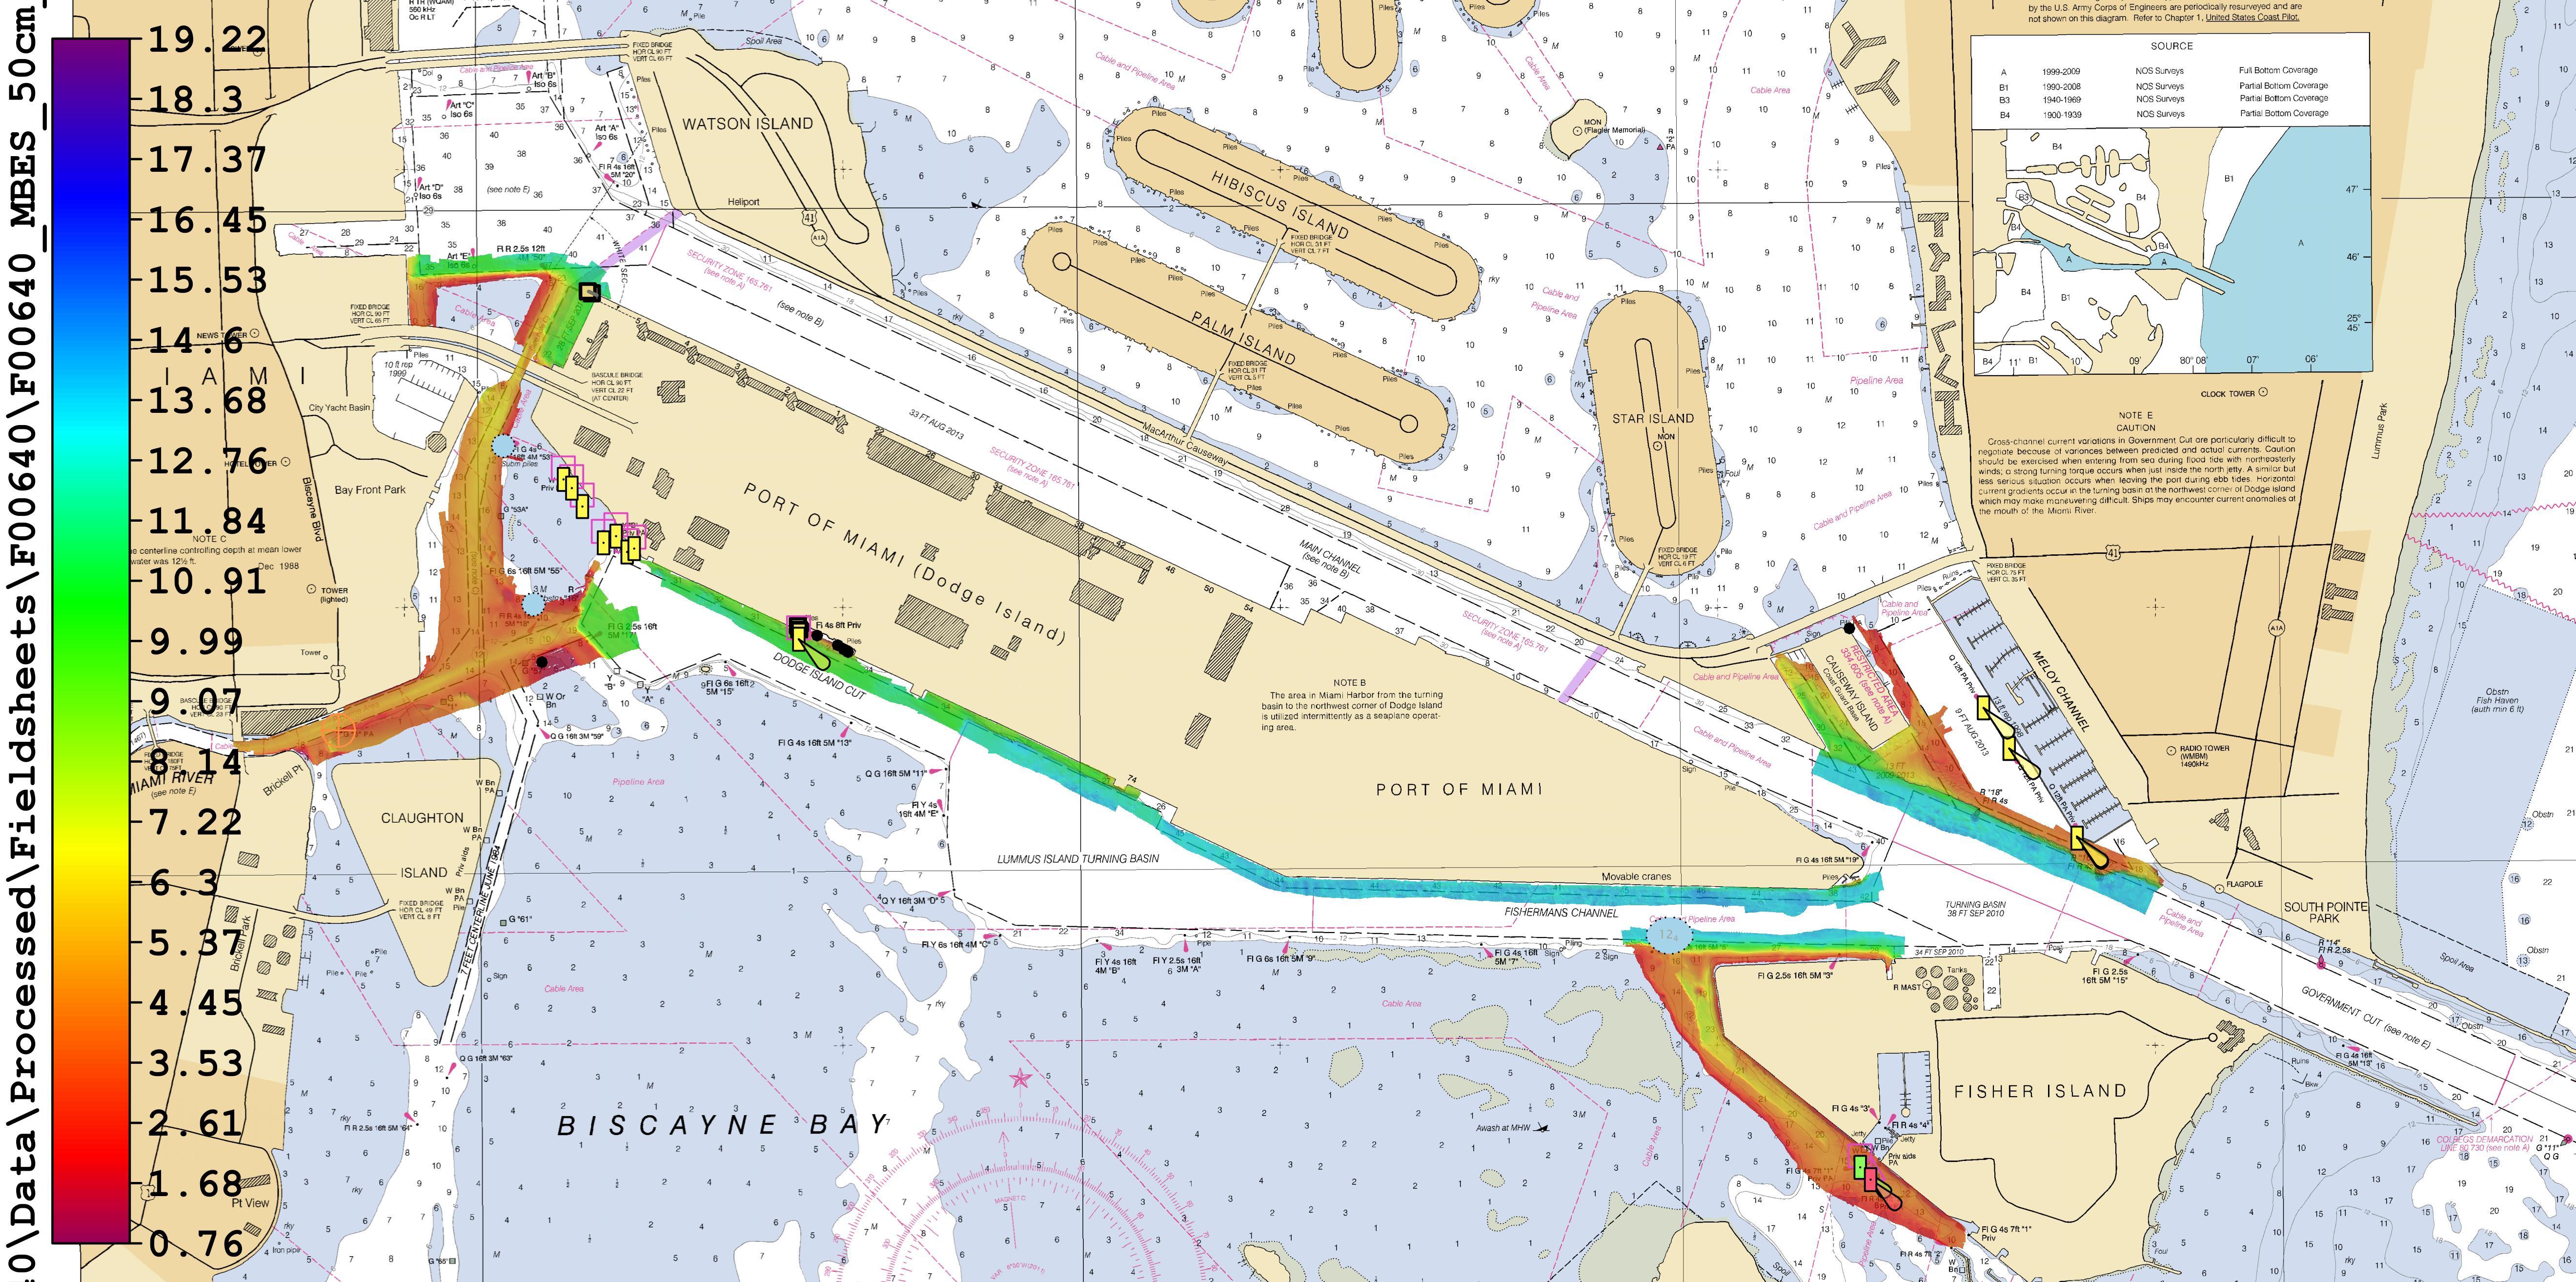 Port Of Benicia Noaa Coast Survey